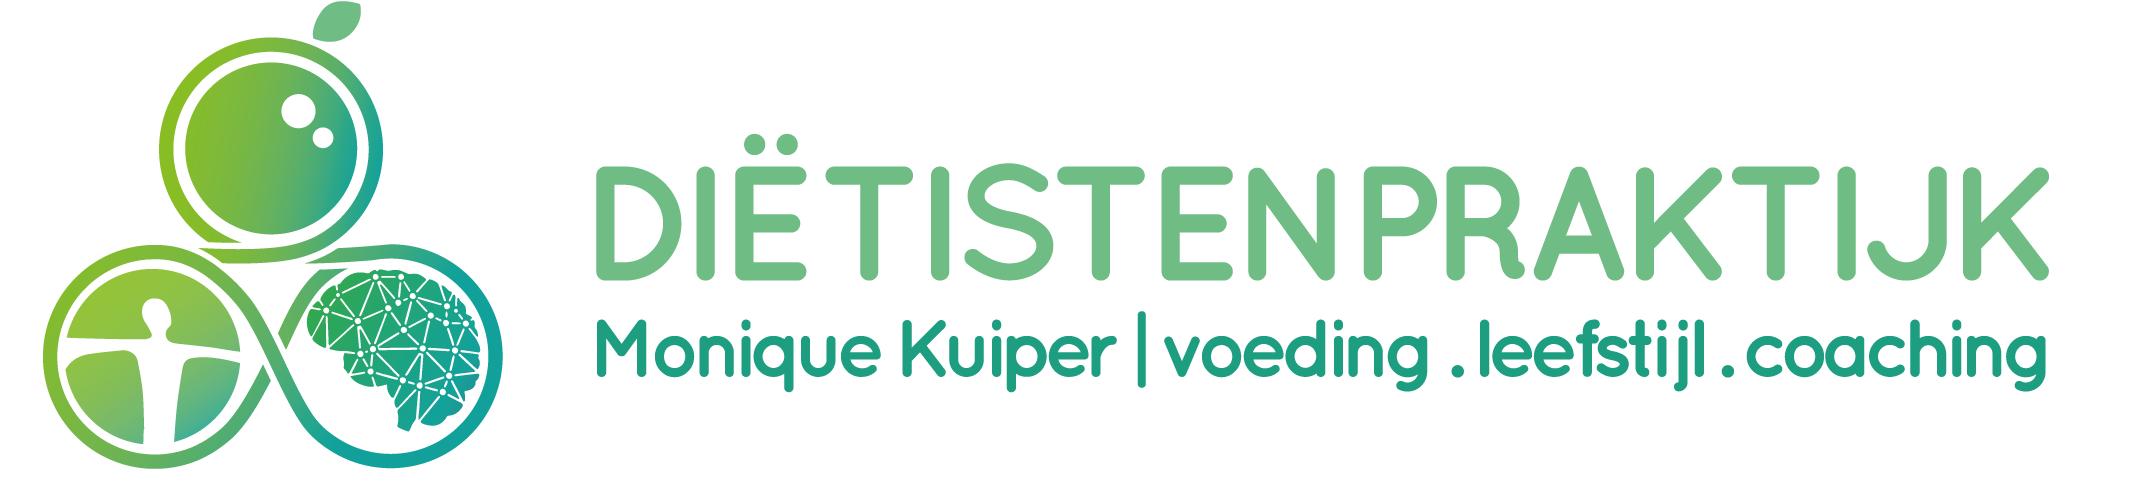 Diëtistenpraktijk Monique Kuiper